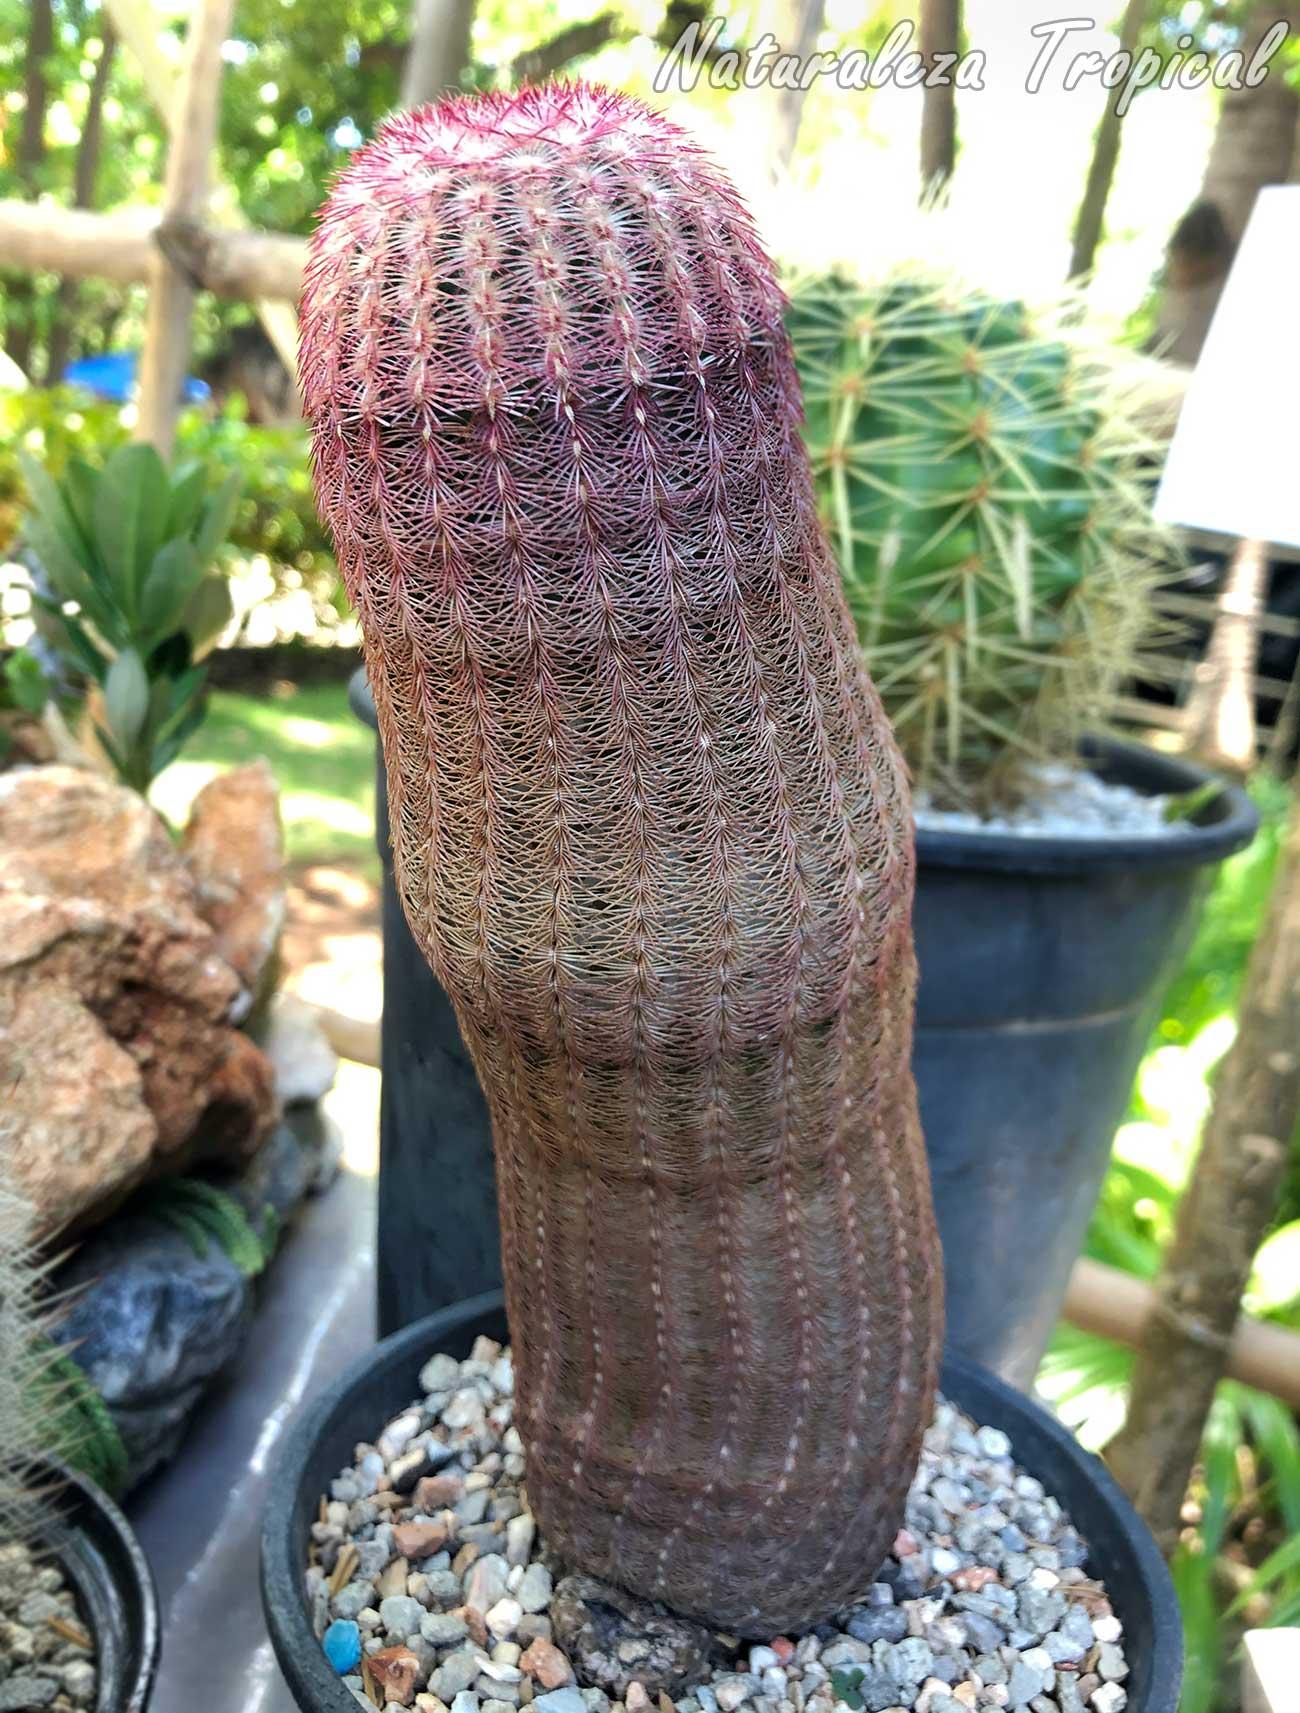 Vista del tallo del cactus ornamental Echinocereus rigidissimus